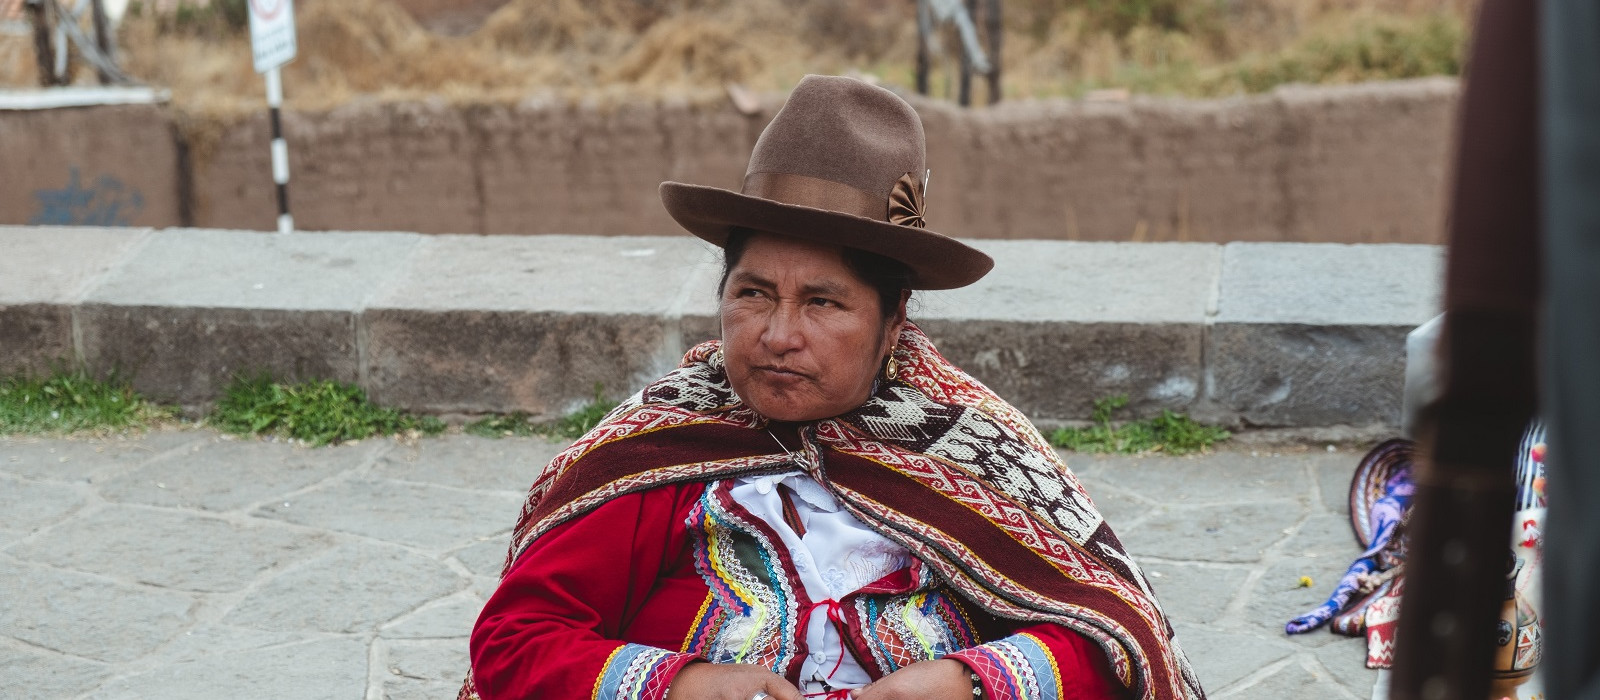 Machu Picchu and the Amazon Tour Trip 1